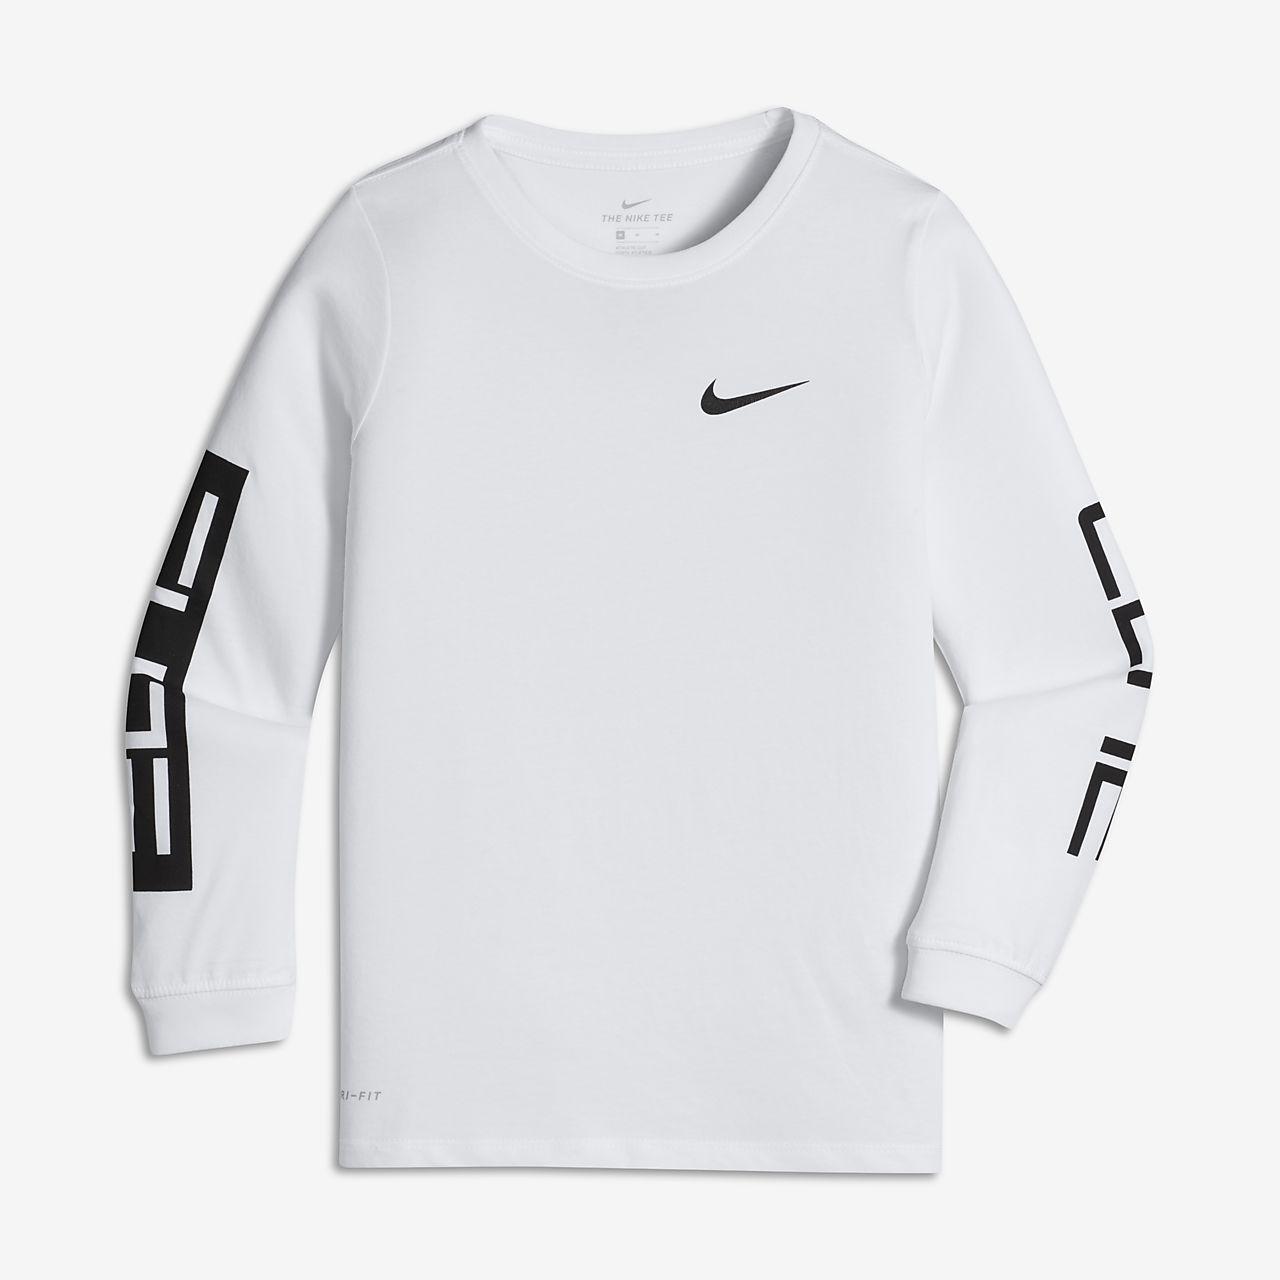 Nike Dri-FIT Big Kids' (Boys') Long Sleeve T-Shirt. Nike.com